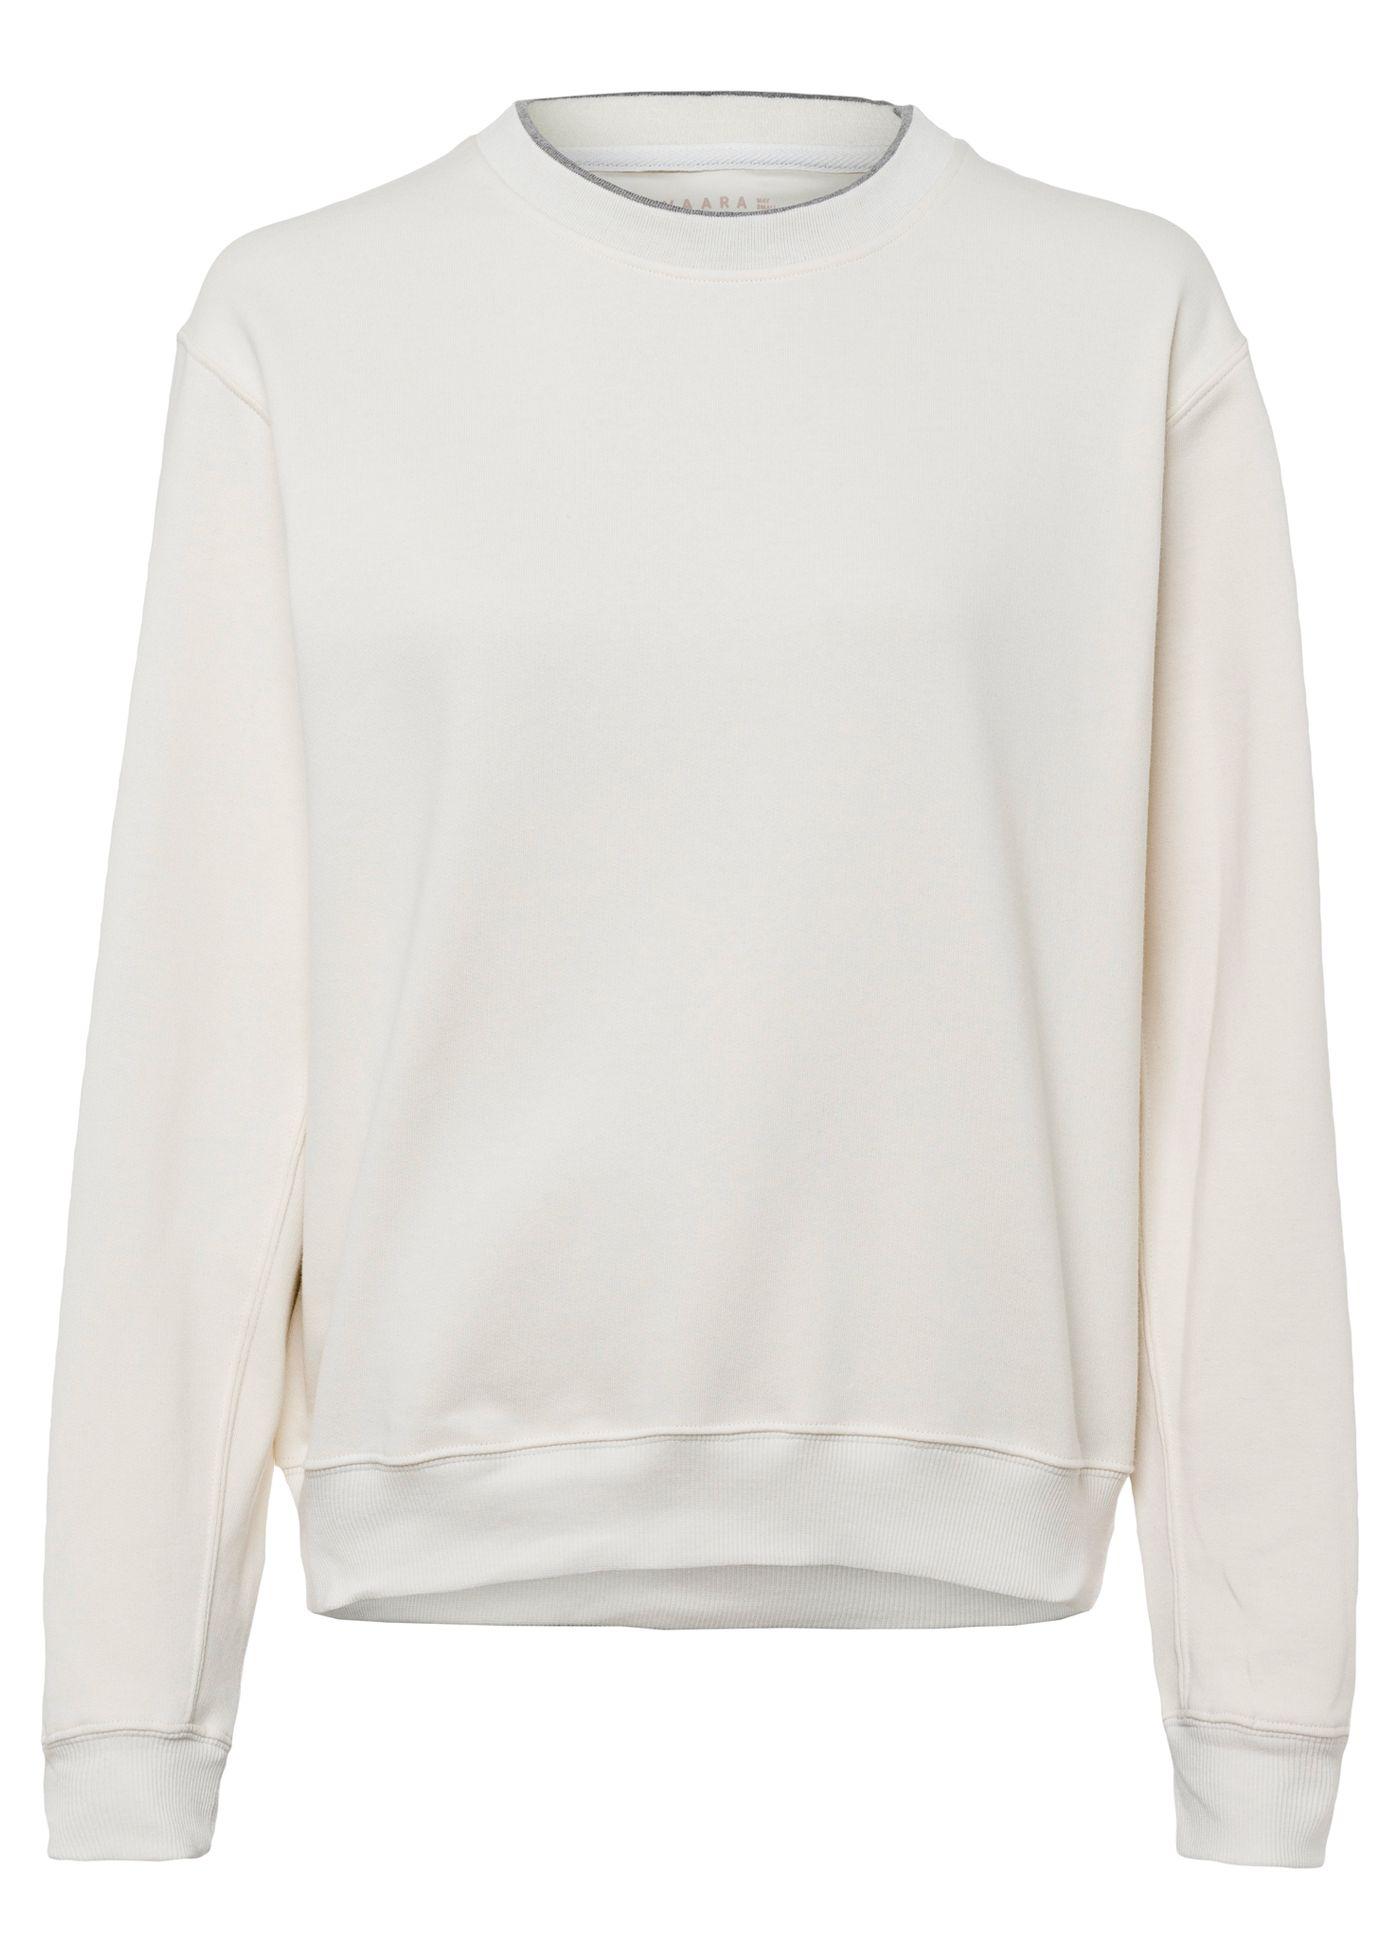 May Organic Sweatshirt image number 4